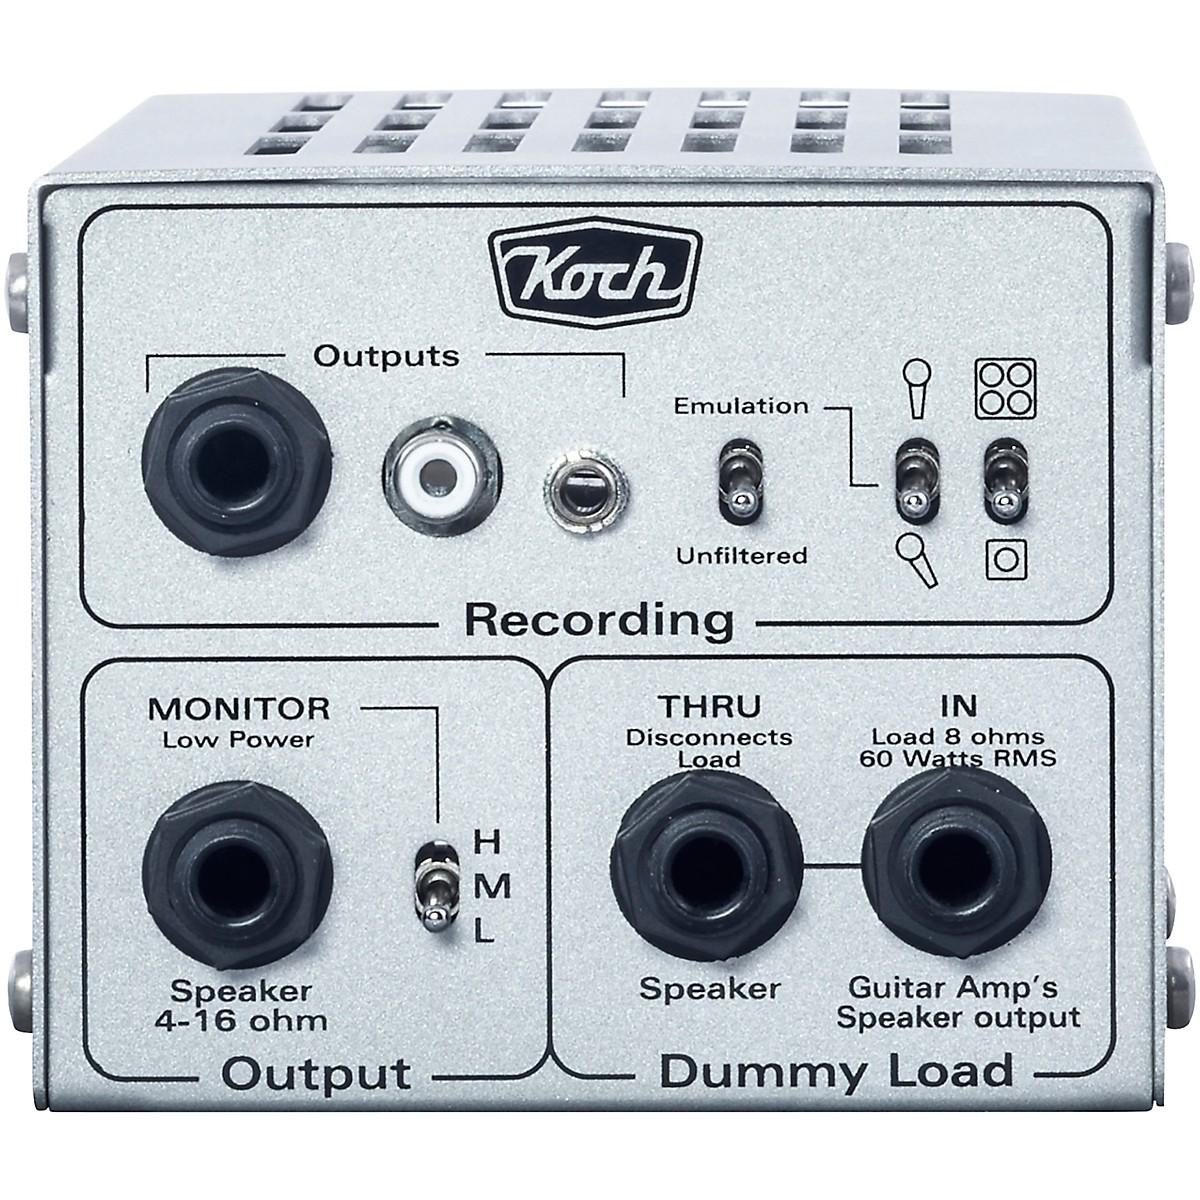 Koch Dummybox Home Load Box